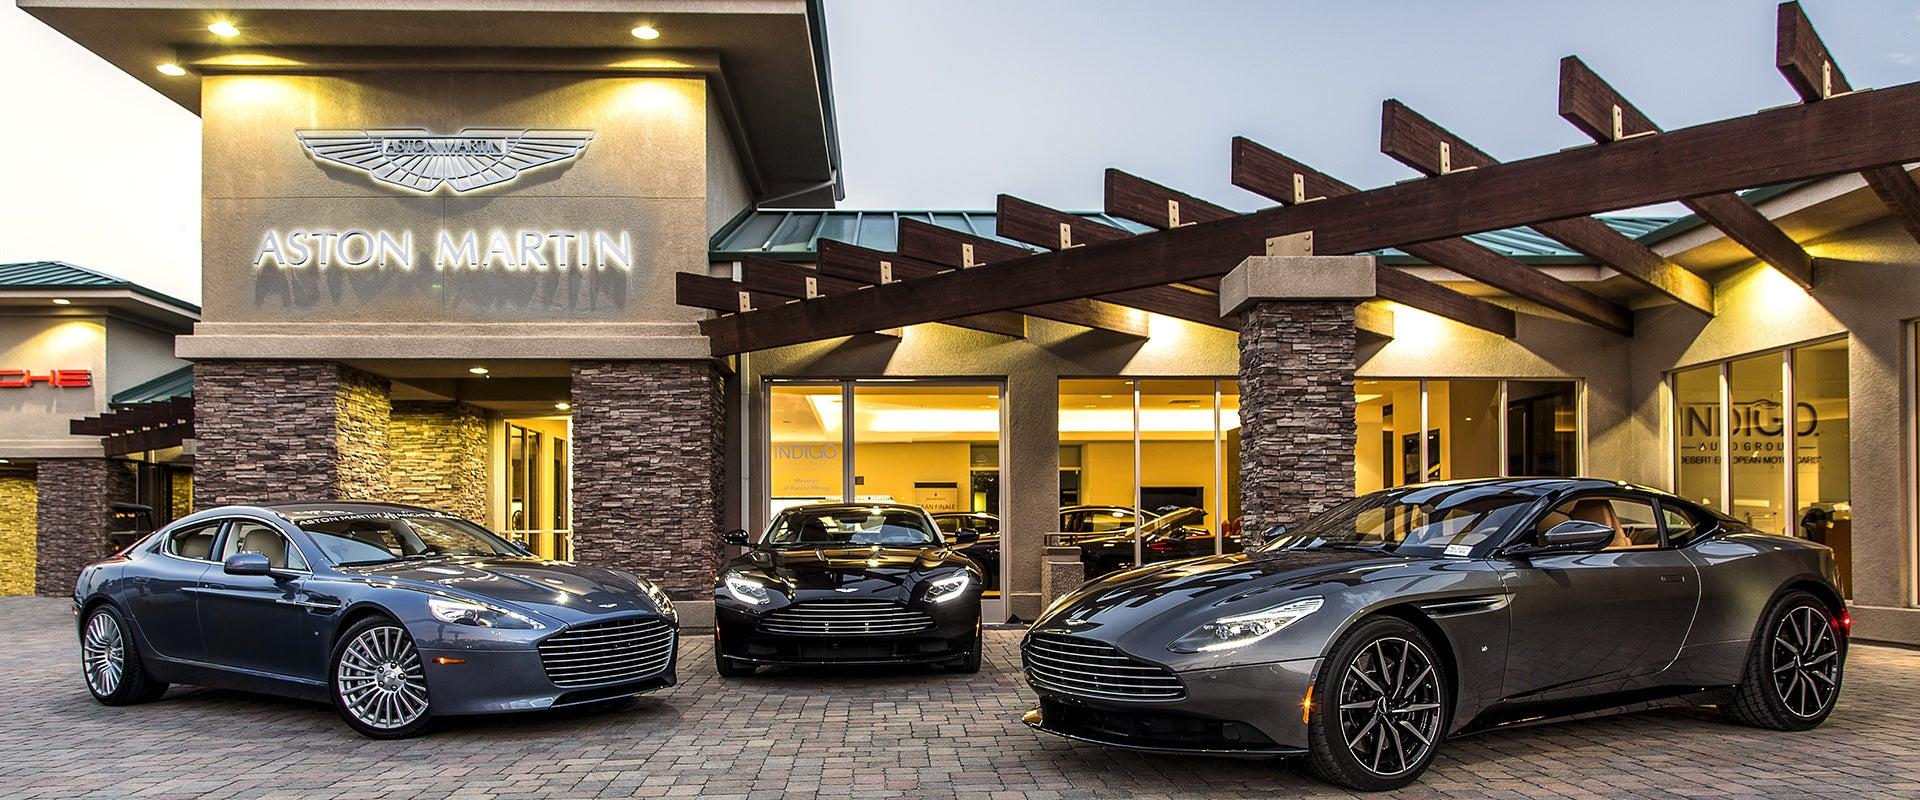 Aston Martin Rancho Mirage Faqs Rancho Mirage Ca